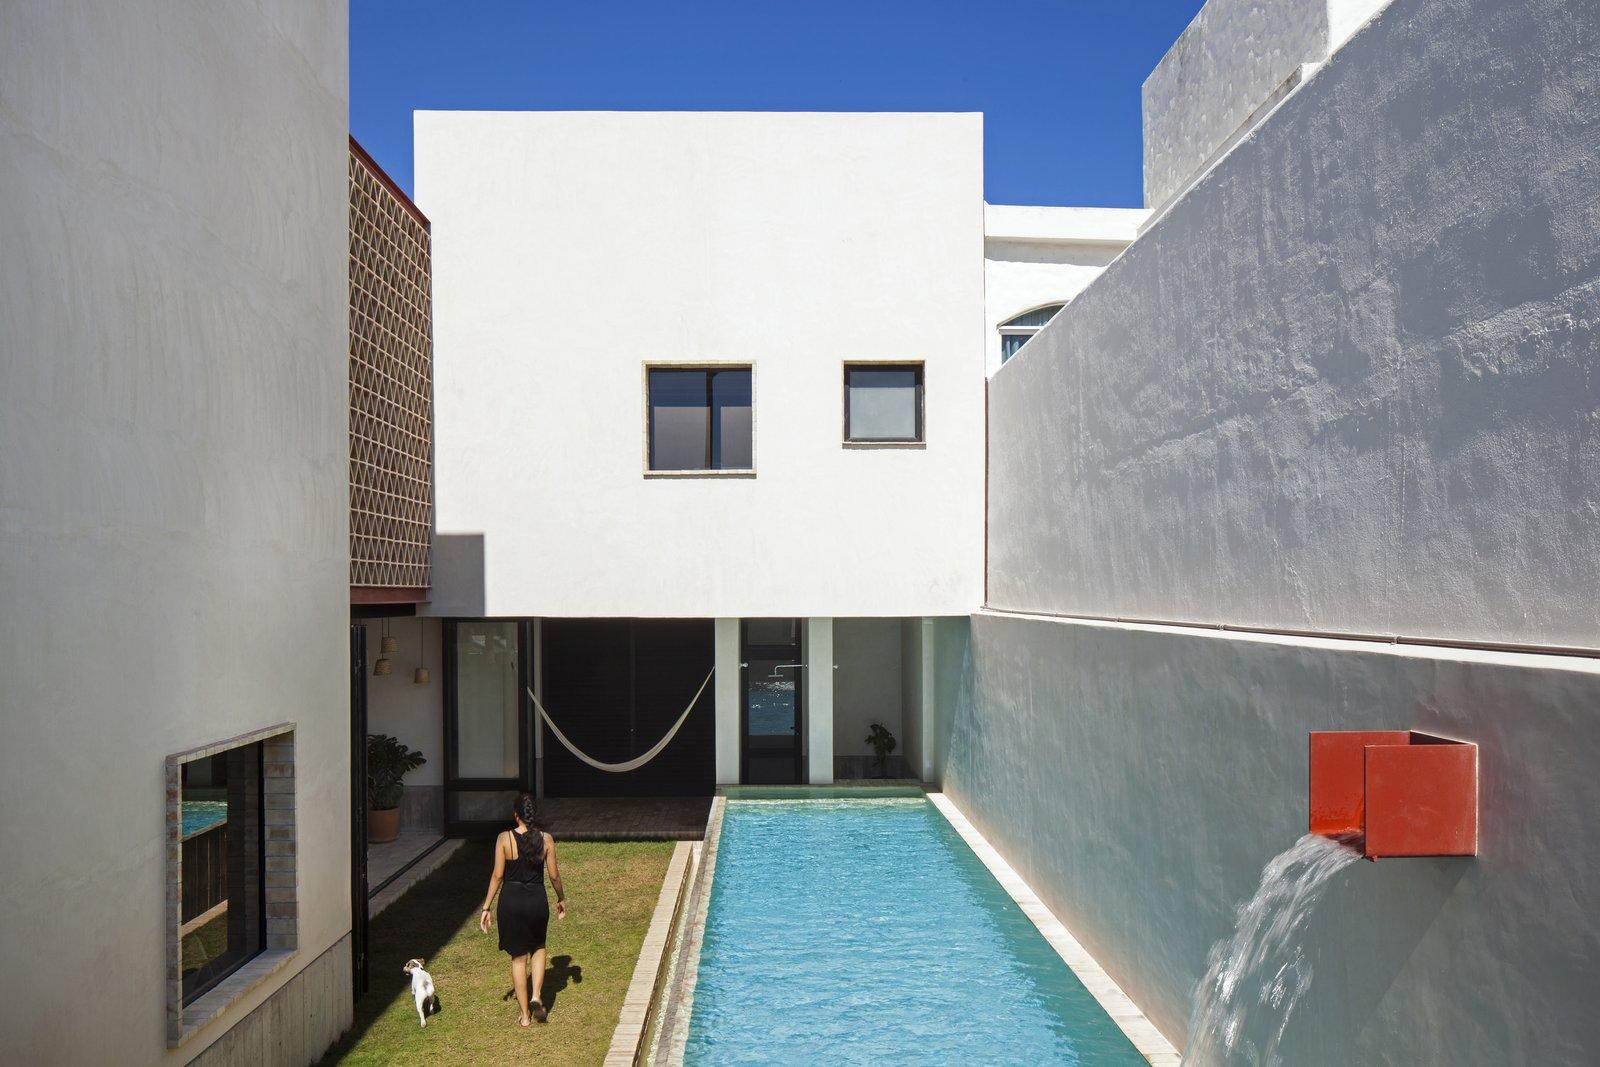 Outdoor and Small Patio, Porch, Deck Patio.  Casa Iguana by OBRA BLANCA